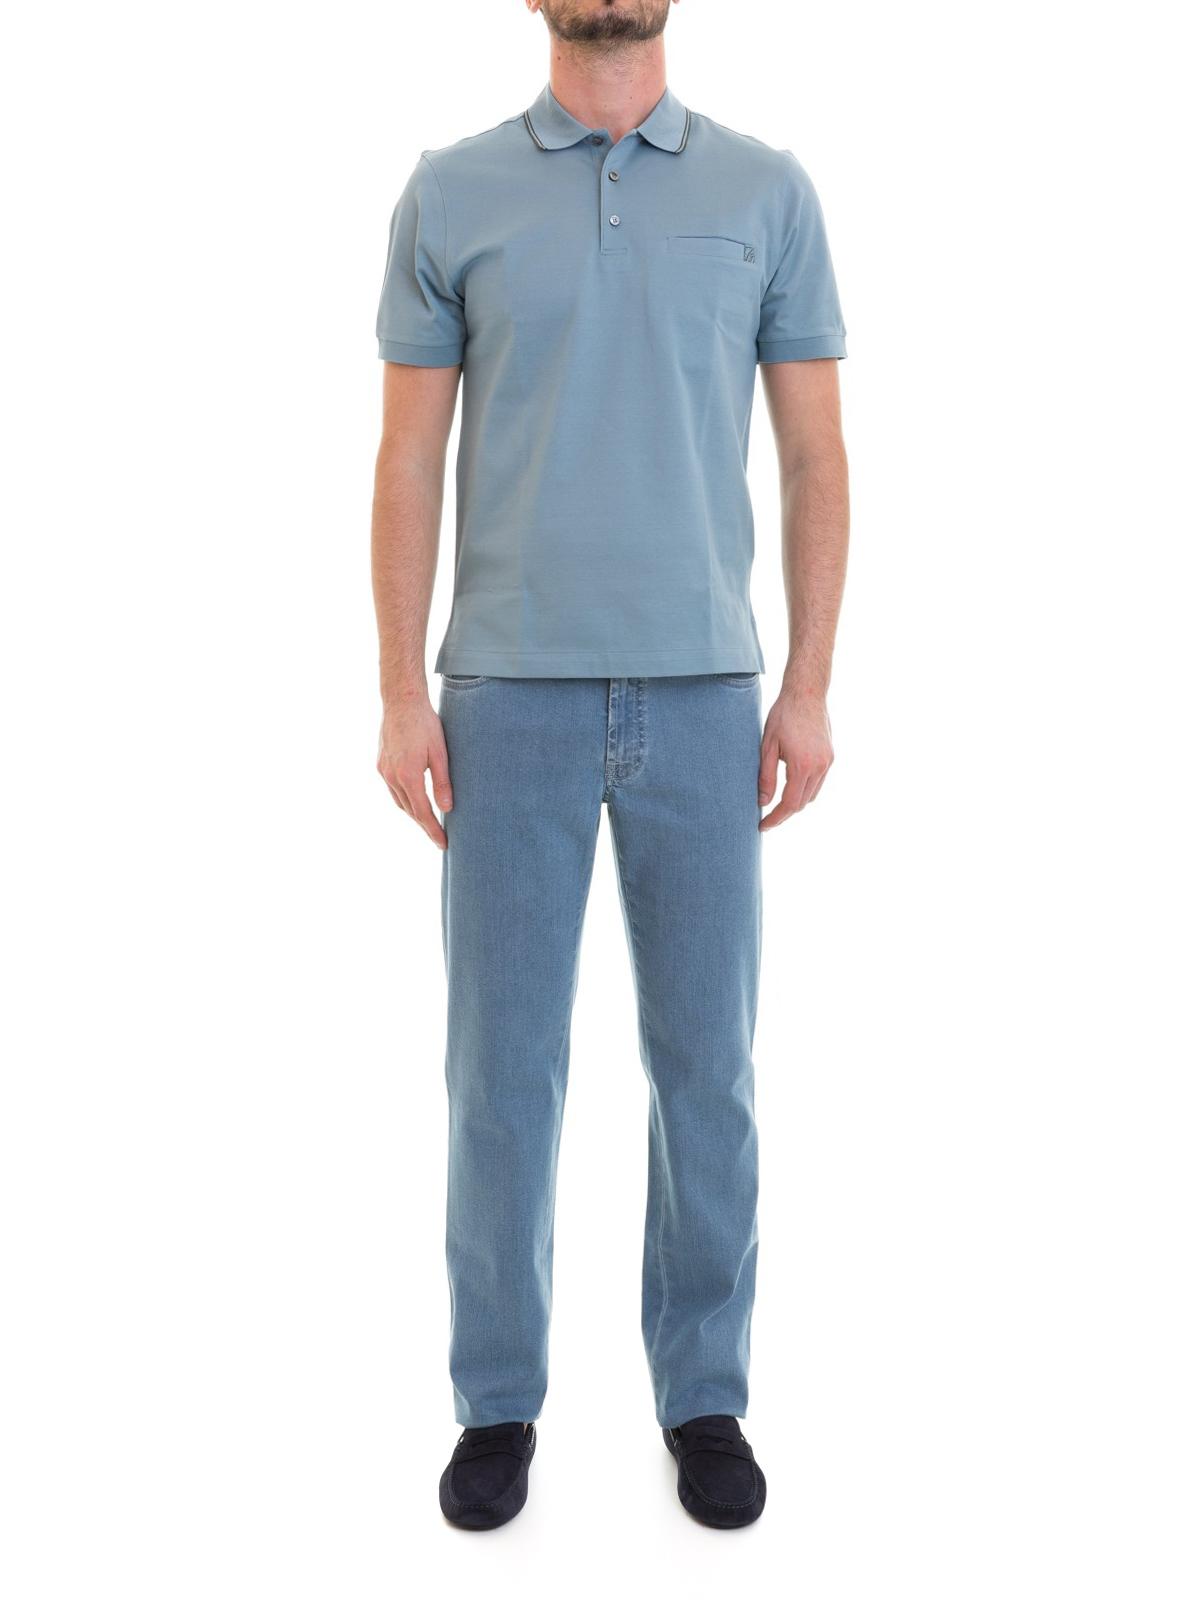 1c2aa6d2 BRIONI: polo shirts online - Chest pocket light blue cotton polo